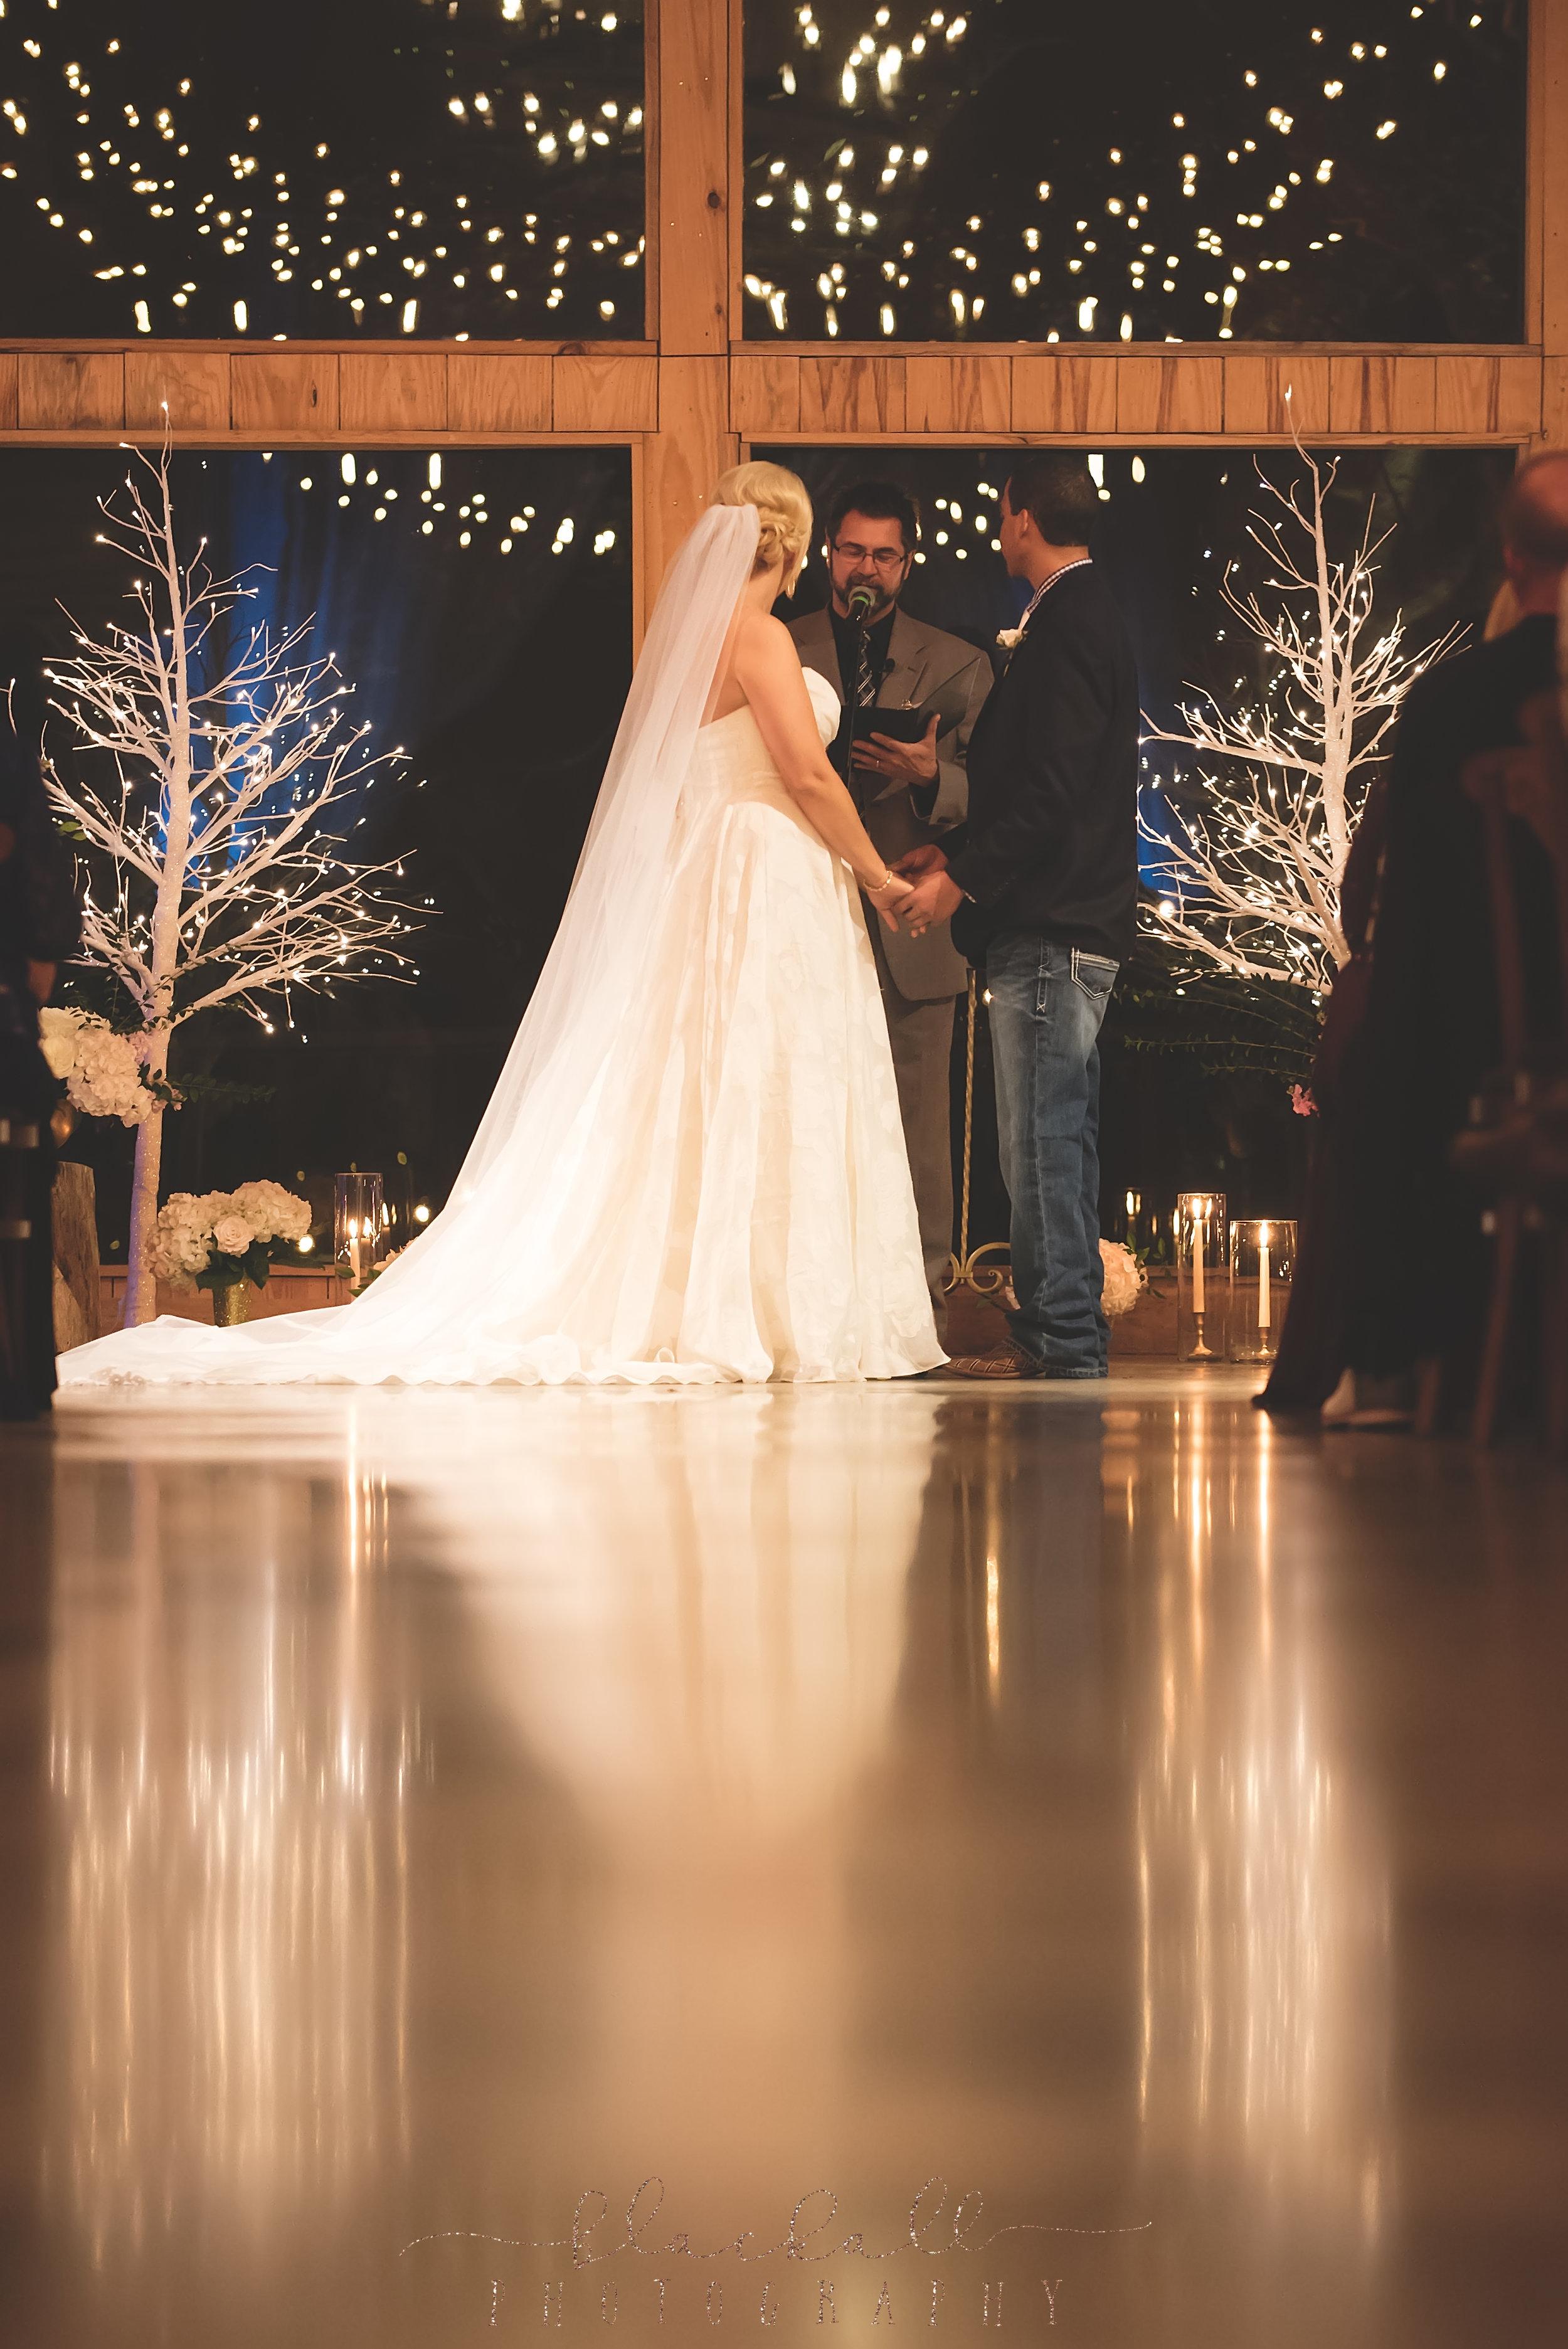 M&M WEDDING_Blackall Photography-41.JPG